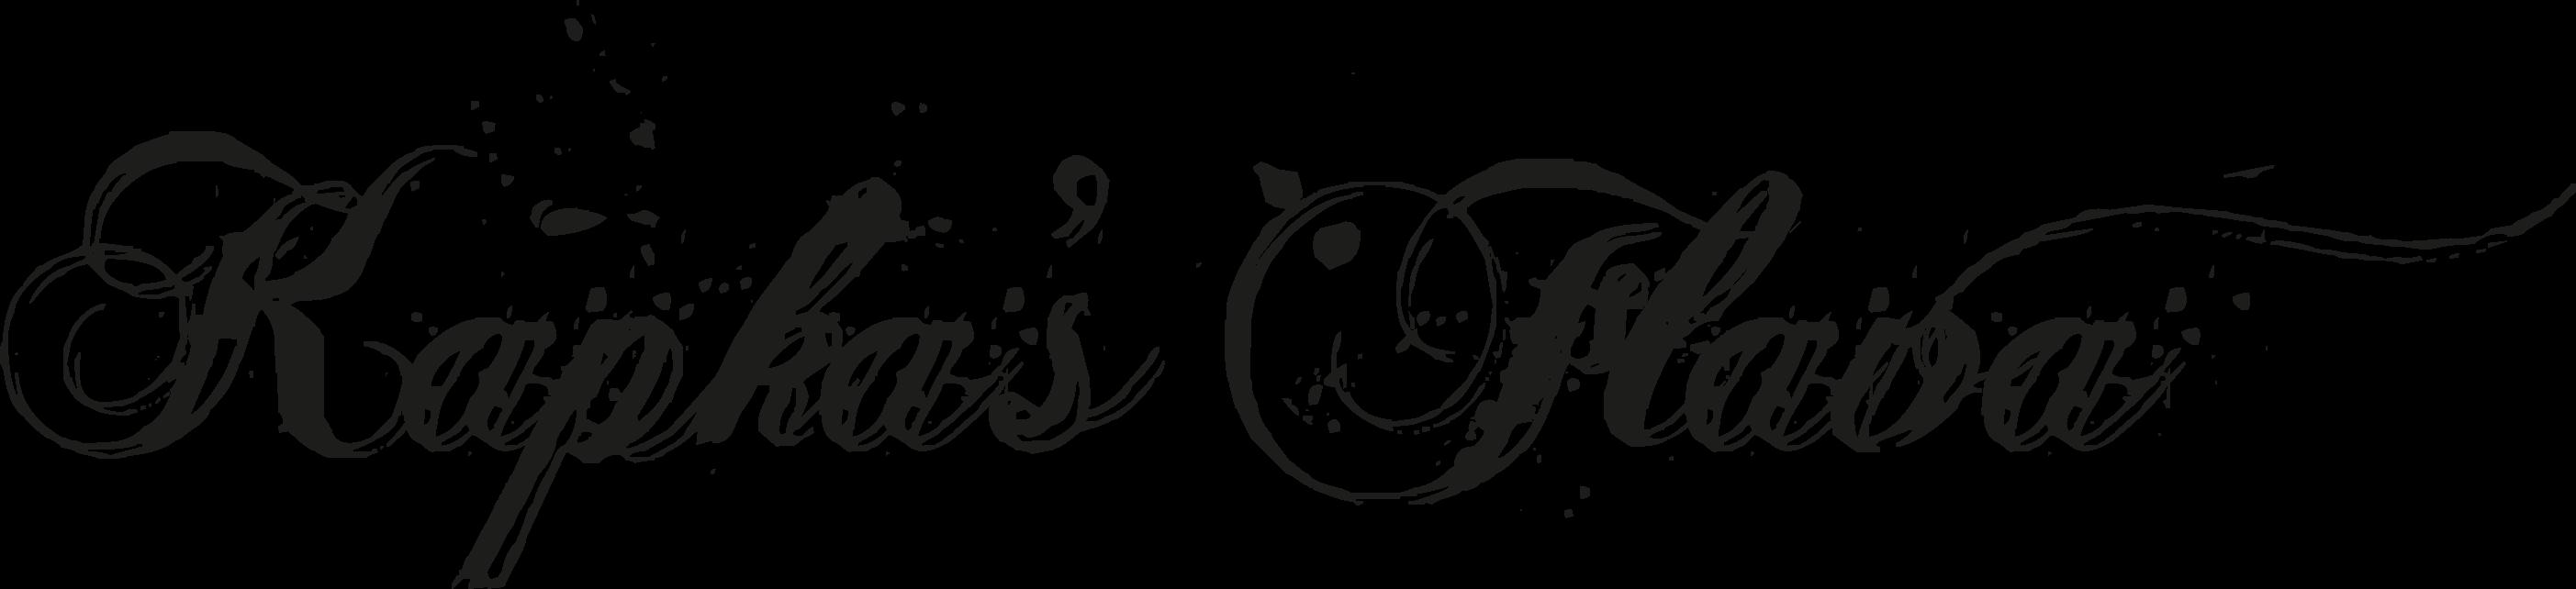 Kapka-s-Flava-Logo-Vektor